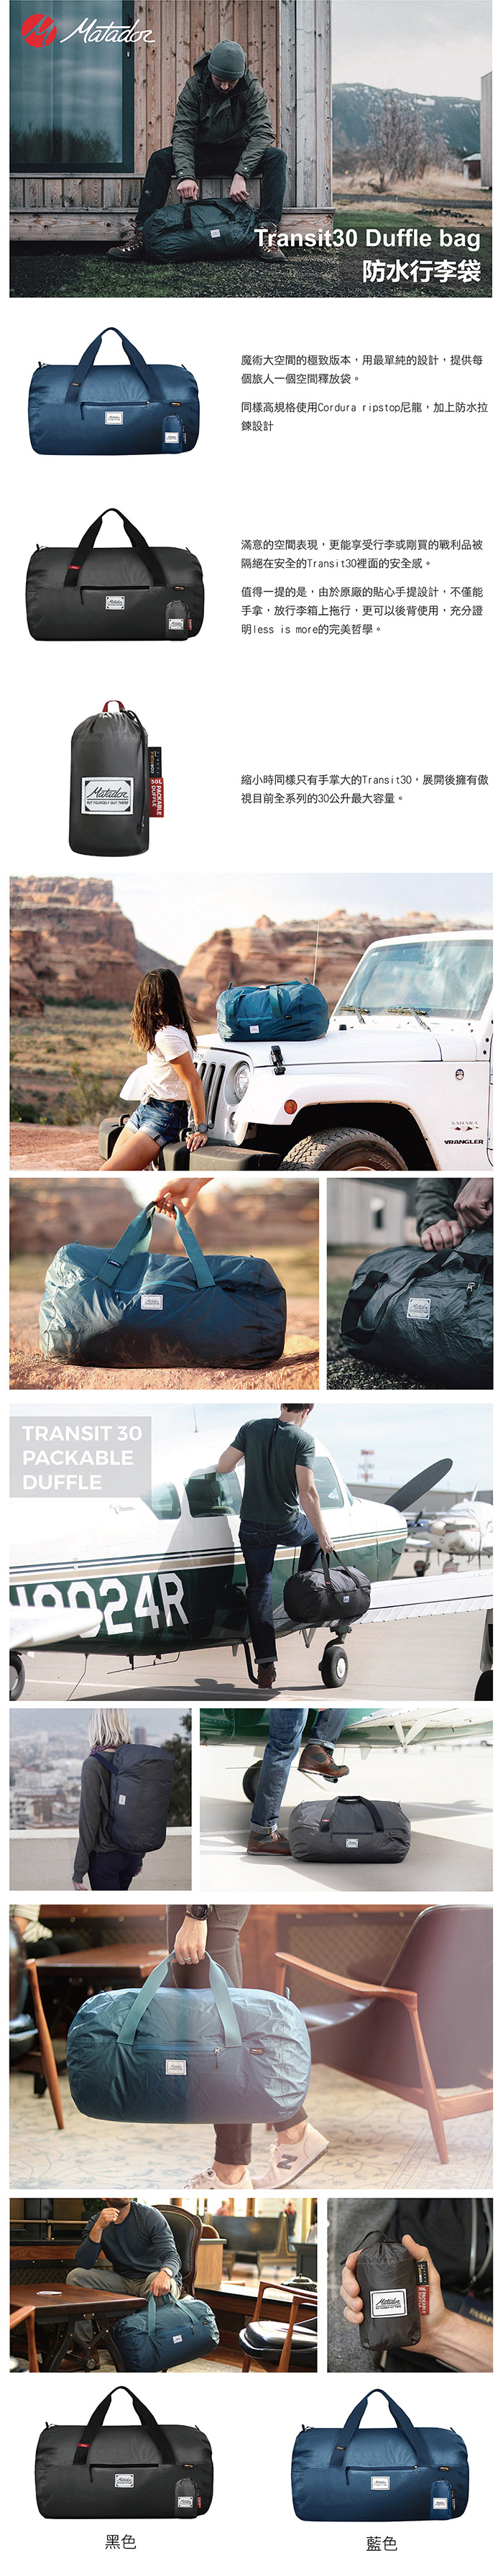 Matador鬥牛士│Transit30 Duffle bag 防水行李袋 (藍色)